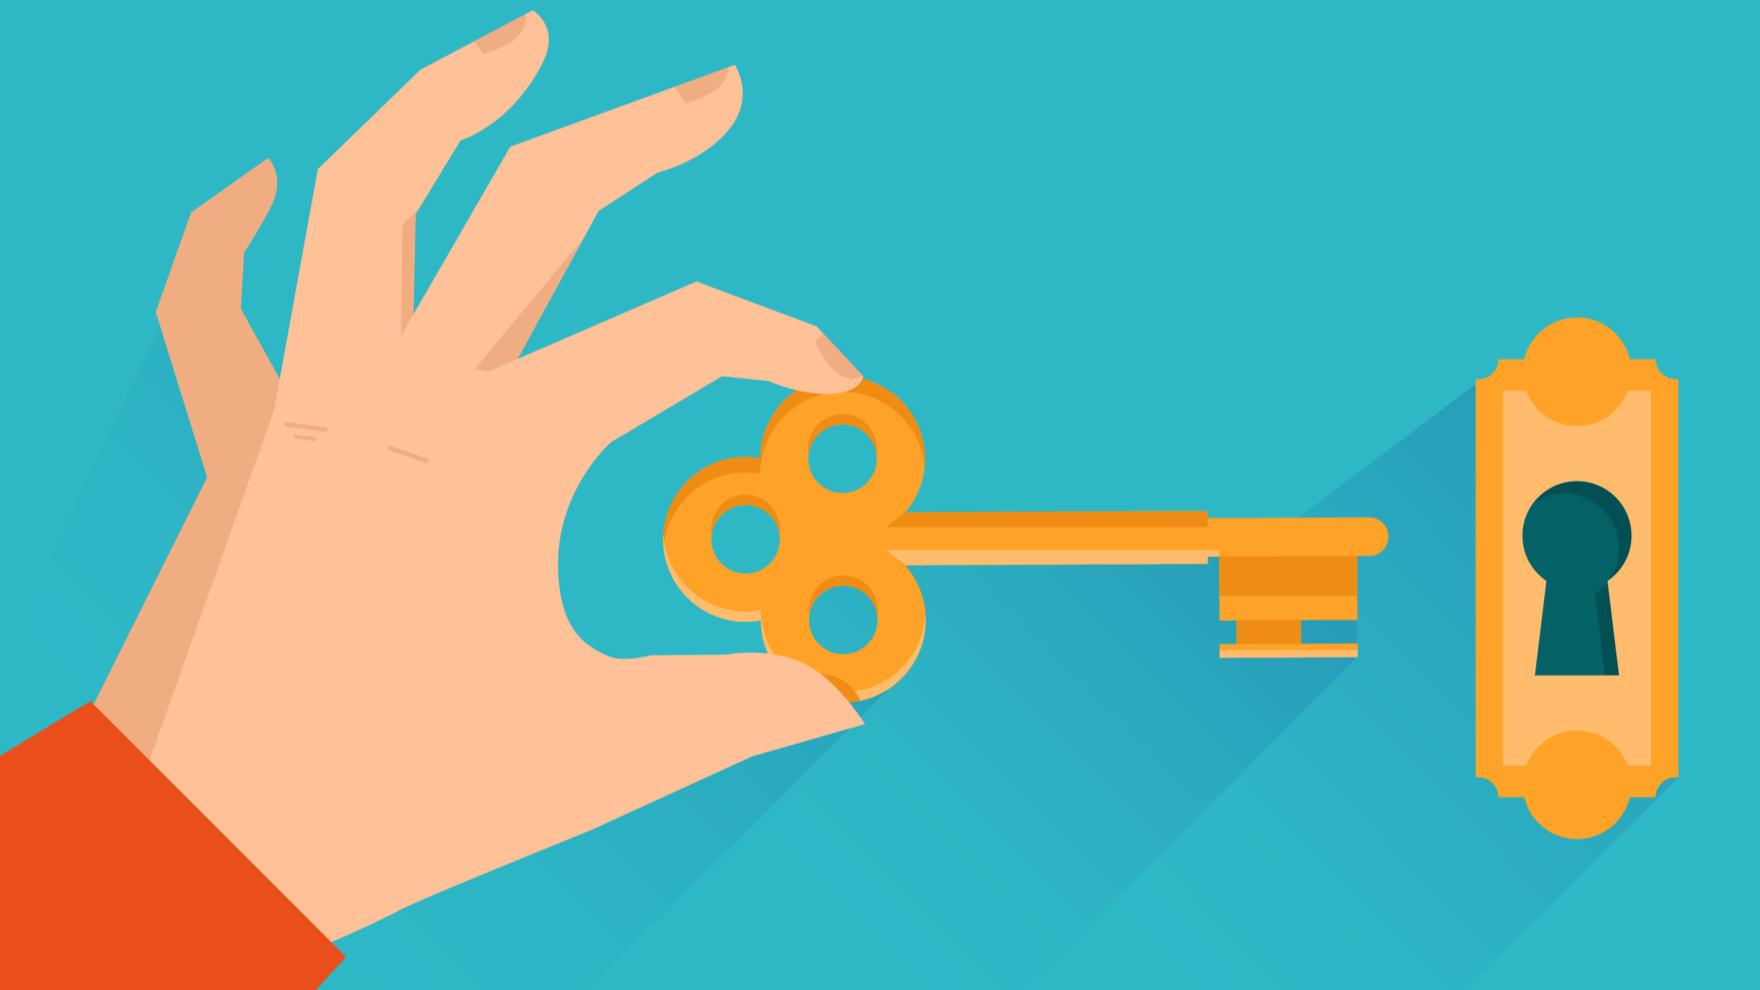 Unlock New Growth Opportunities Through Digital Transformation